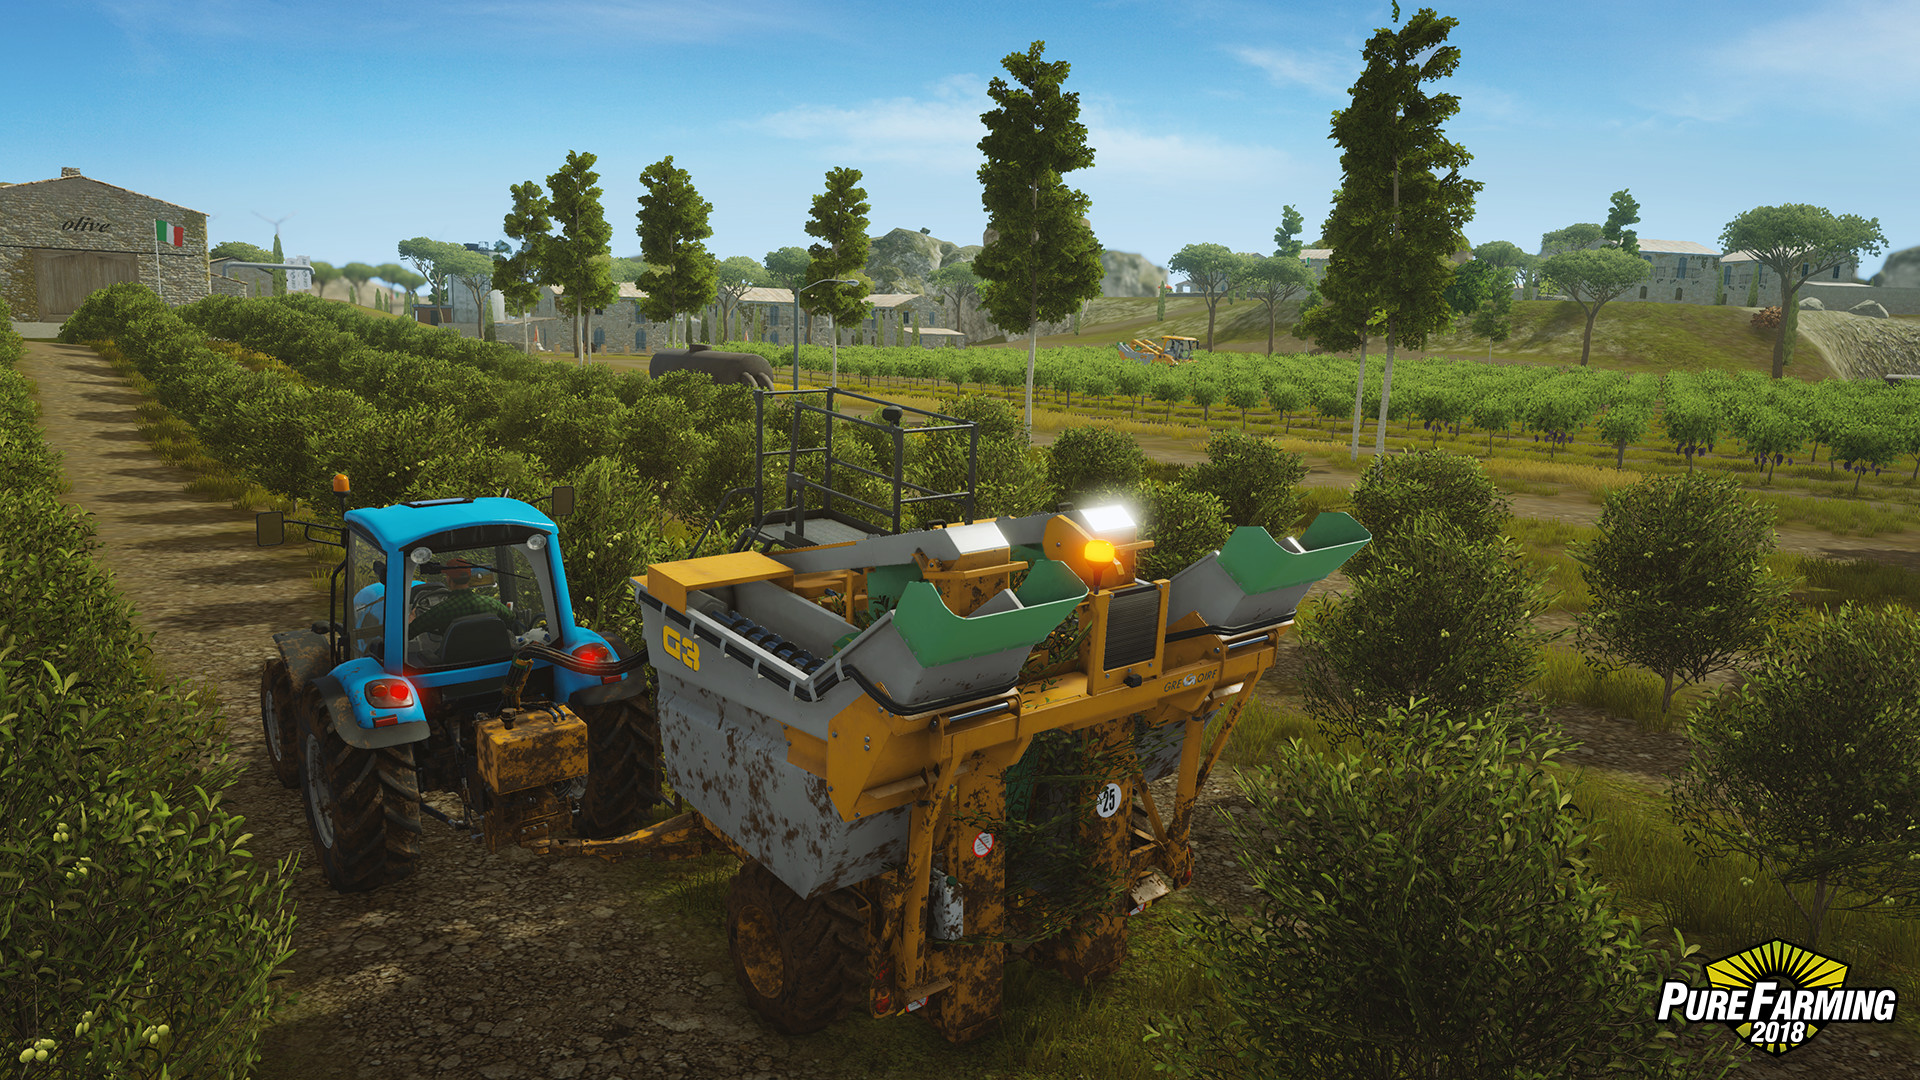 pure farming 2018 download torent